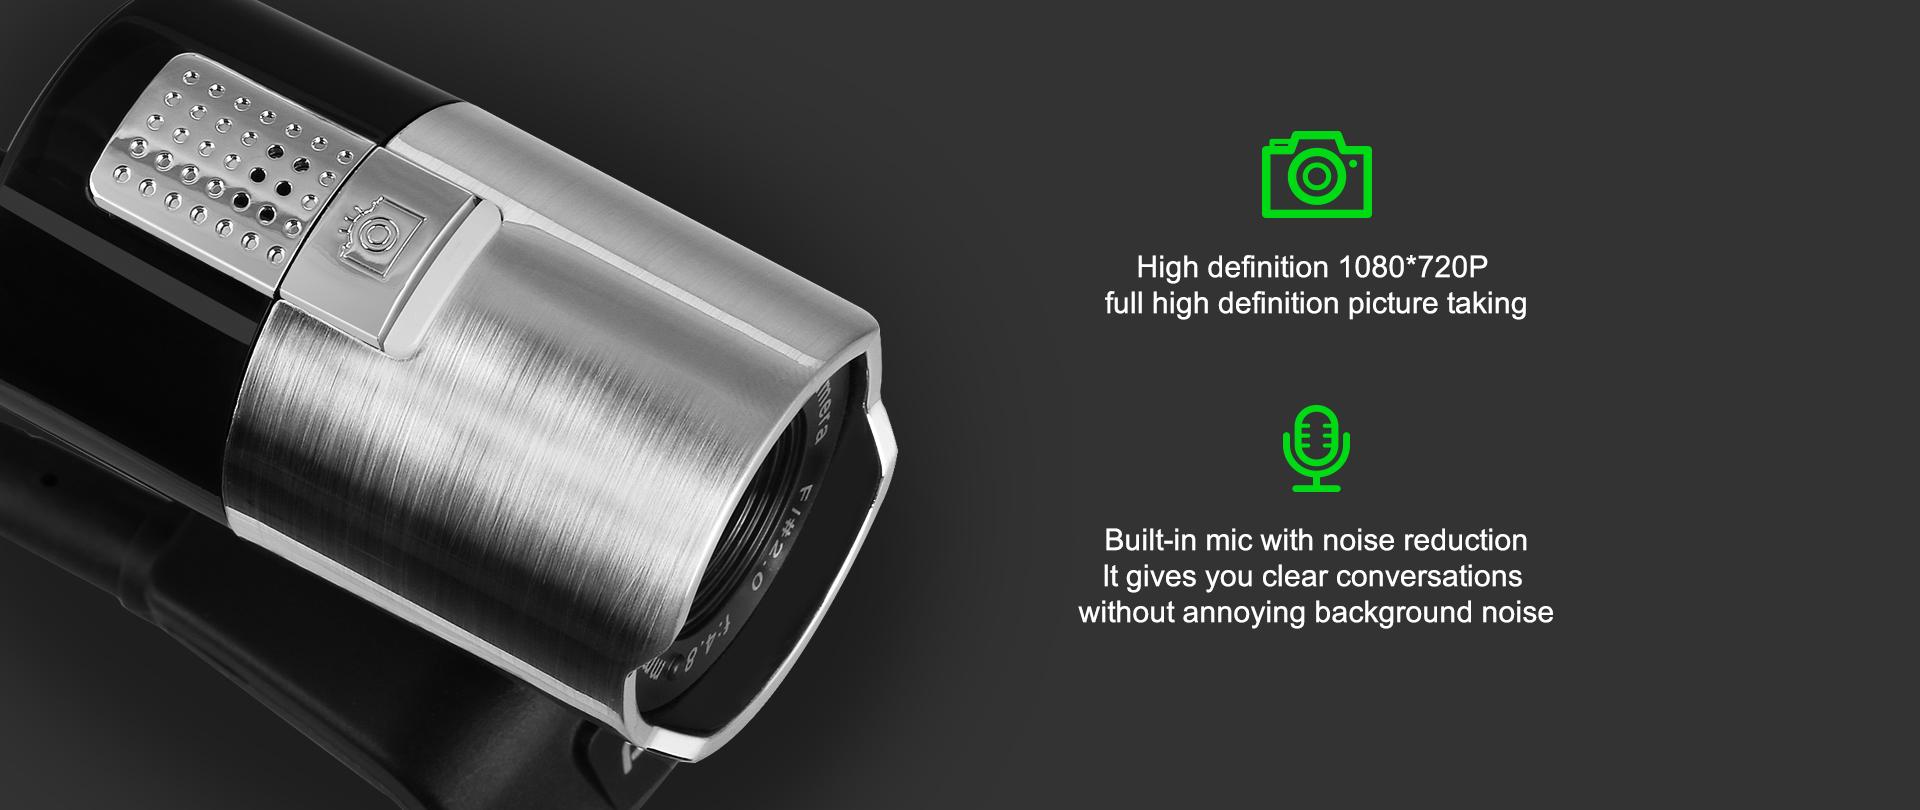 Webcam Ausdom AW335 full HD 1080p, 2mpx - 162537